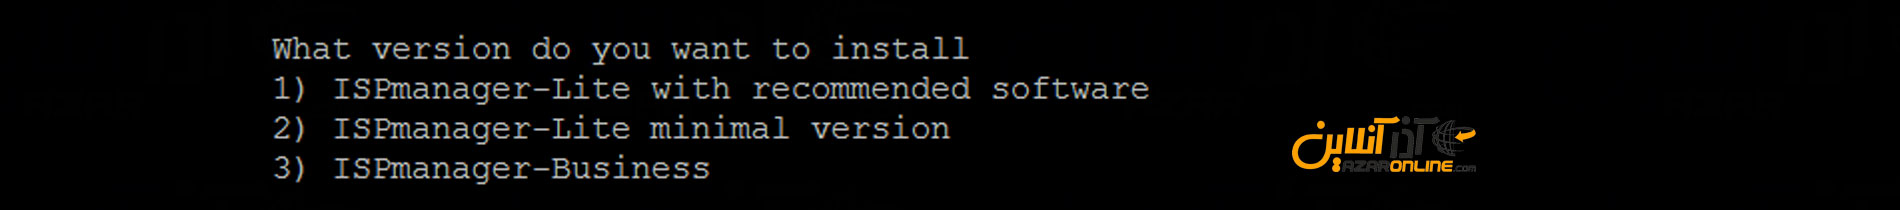 نوع ورژن ISPmanager